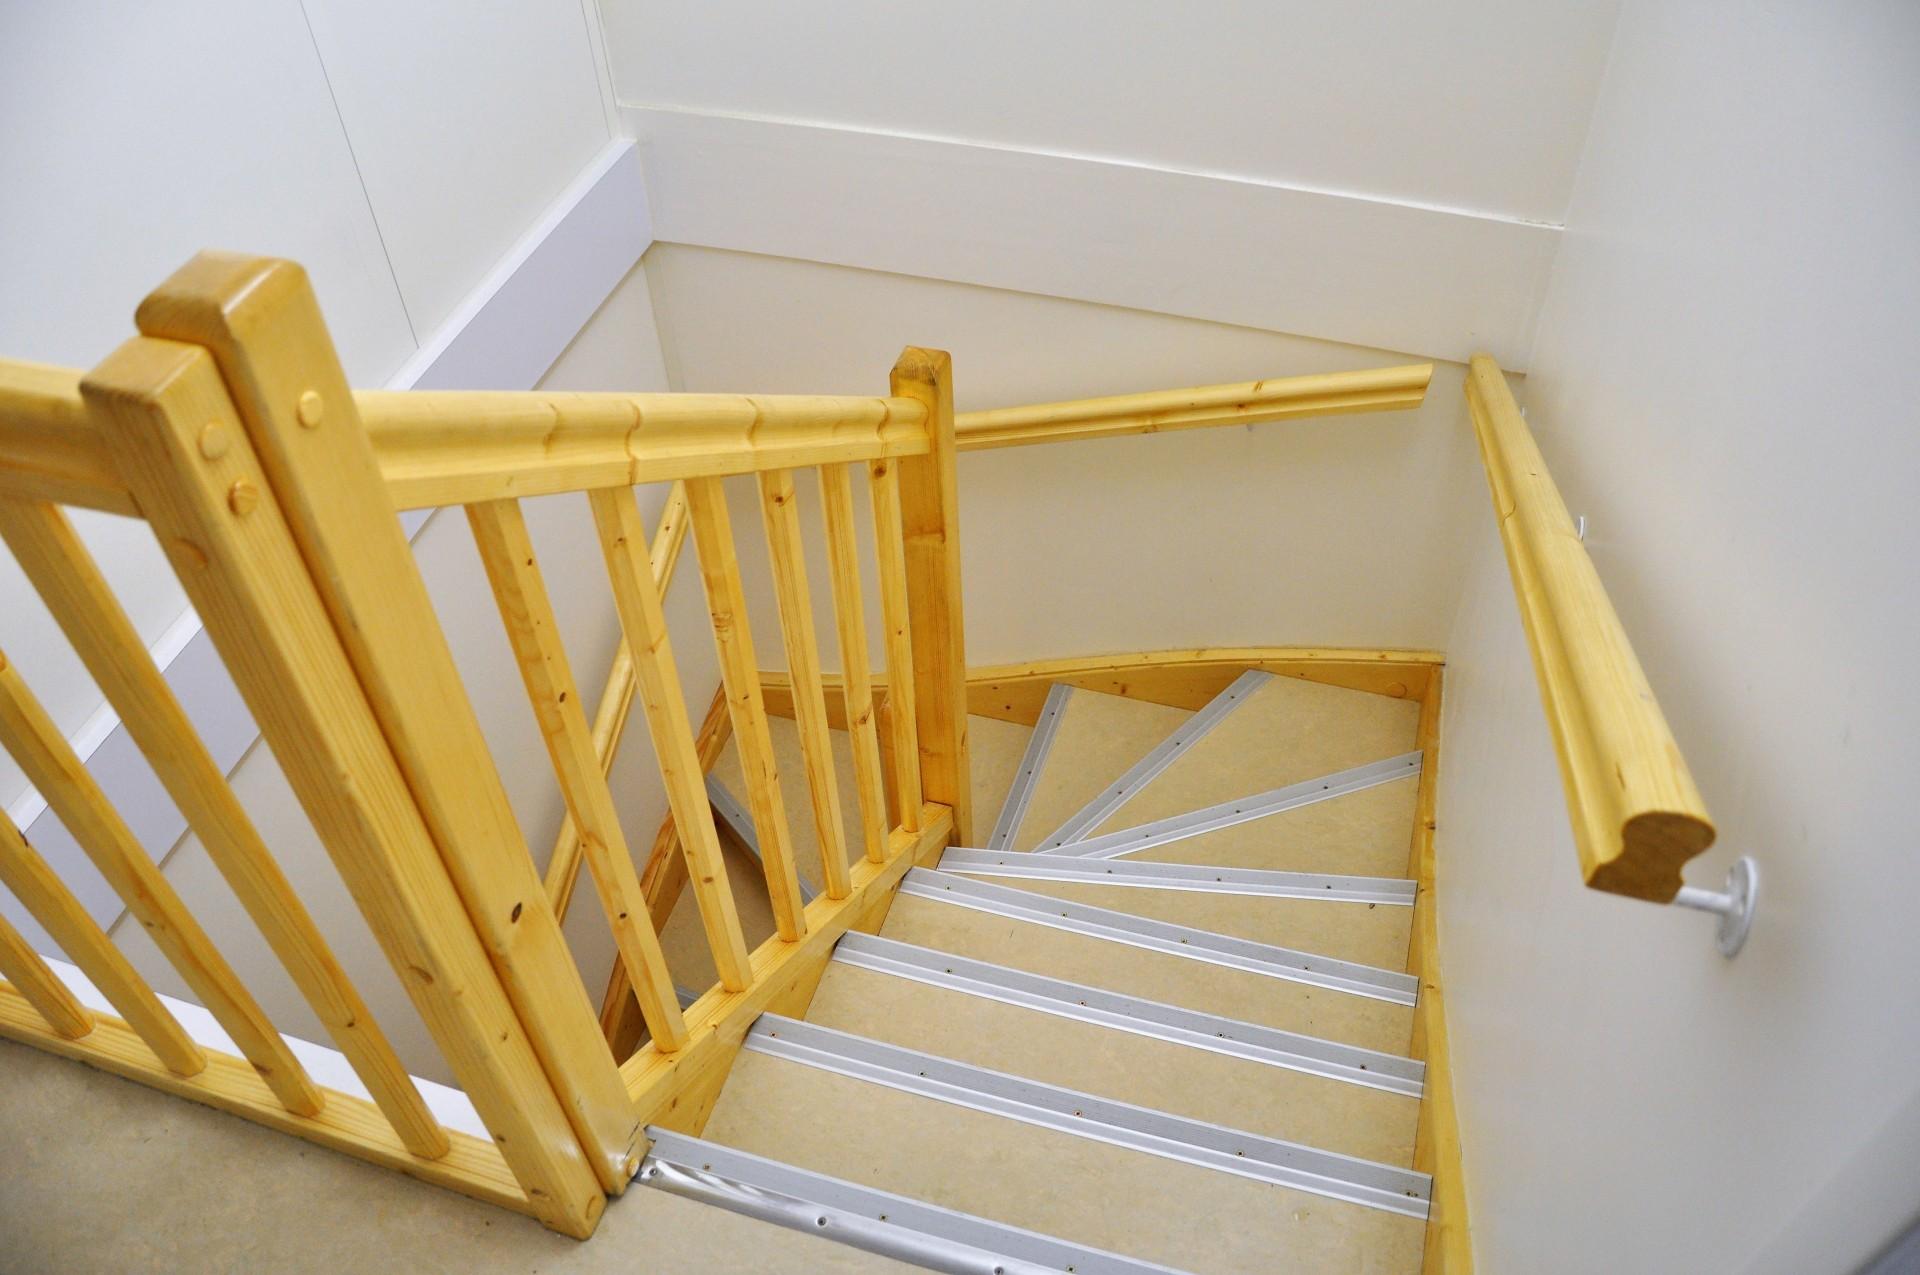 MENUISERIES INTERIEURES - Escalier en sapin 2 quarts tournants